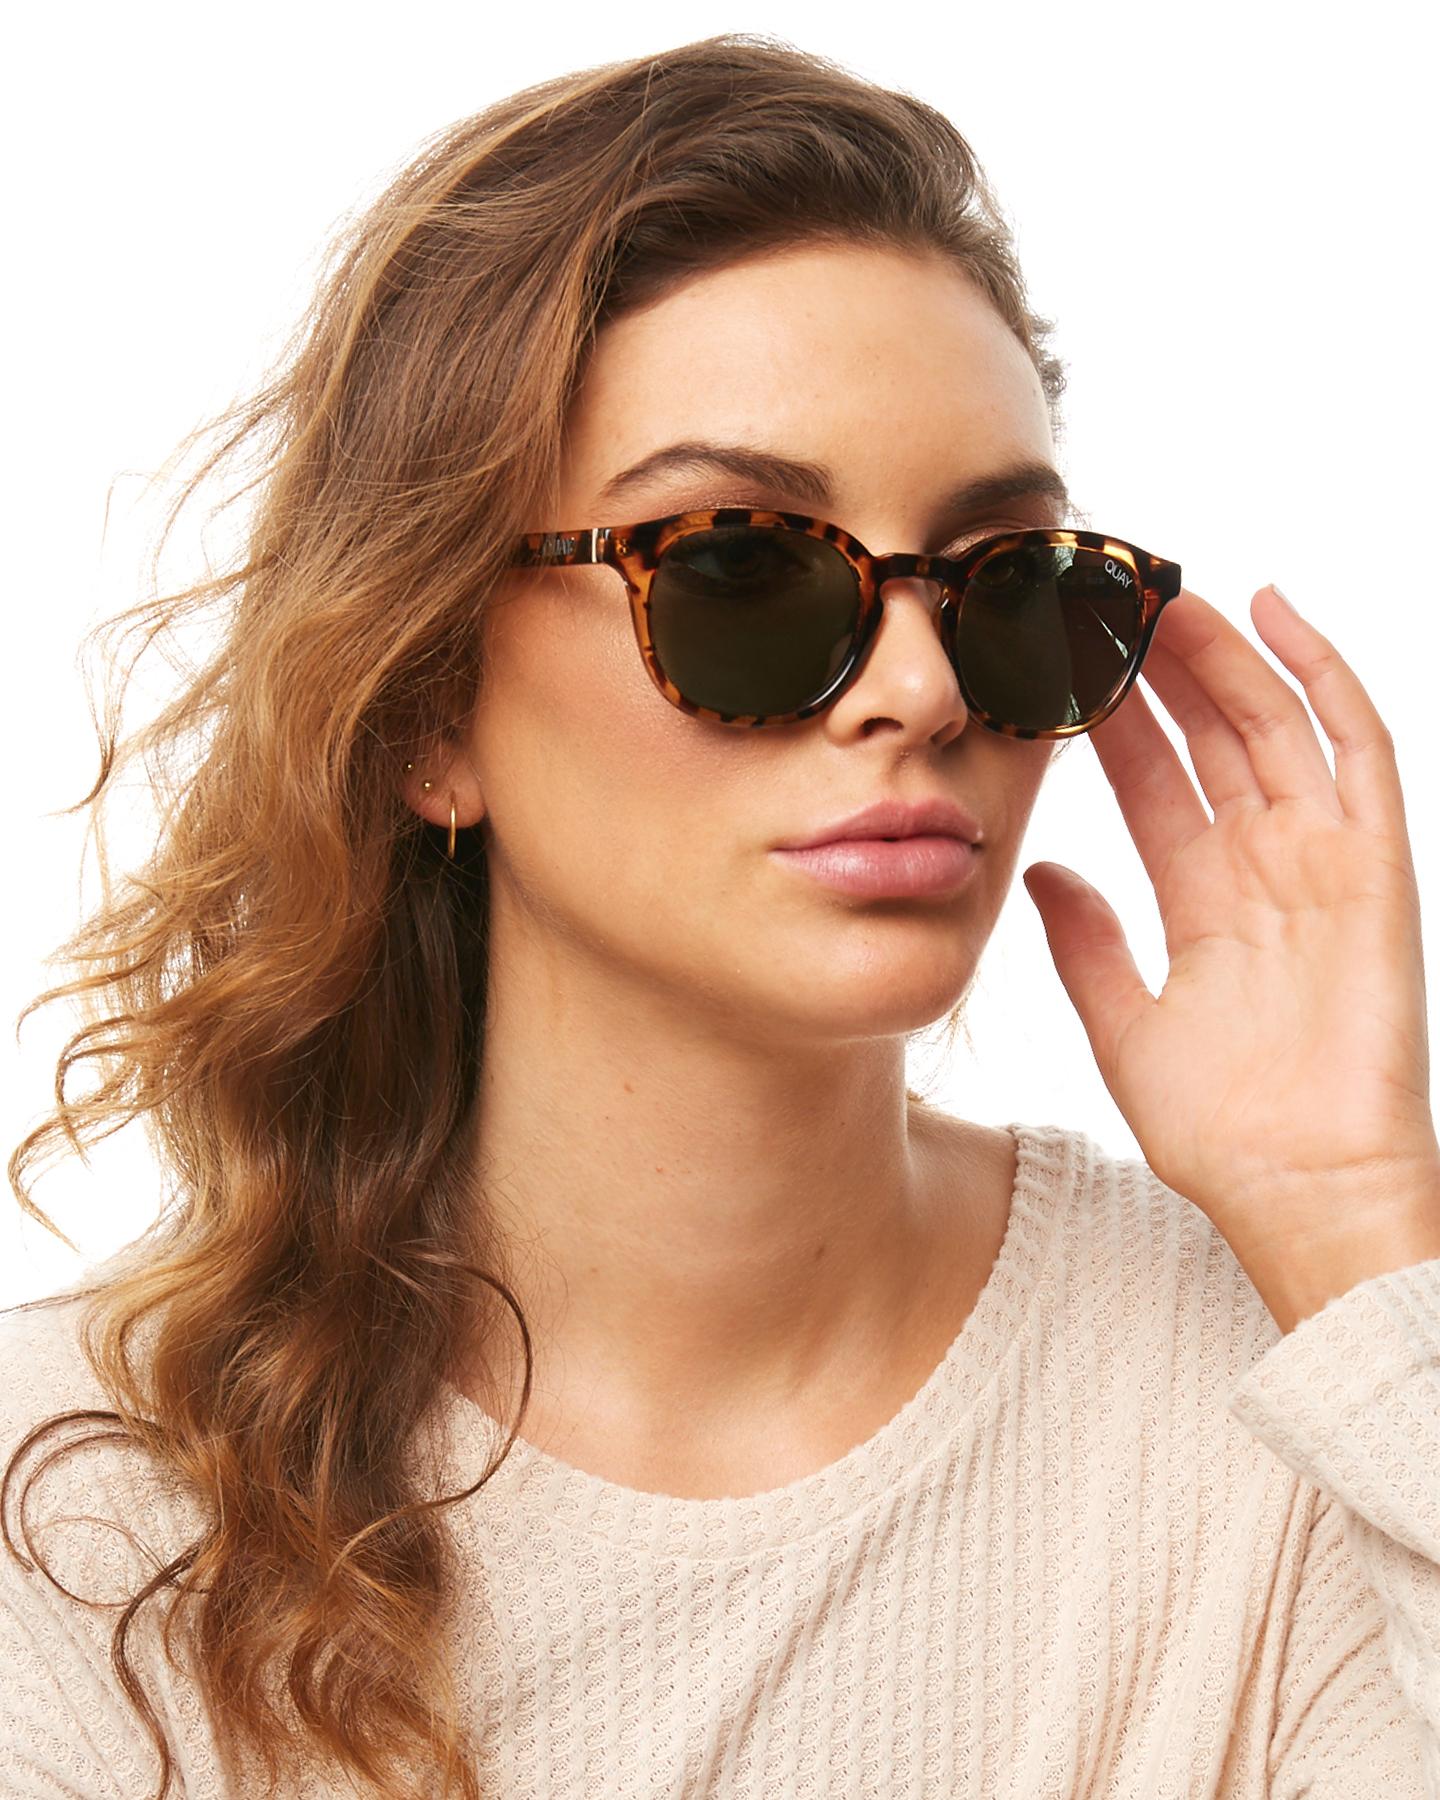 88a02ef3 Quay Eyewear Men's Walk On Sunglasses Stainless Steel Polyester ...